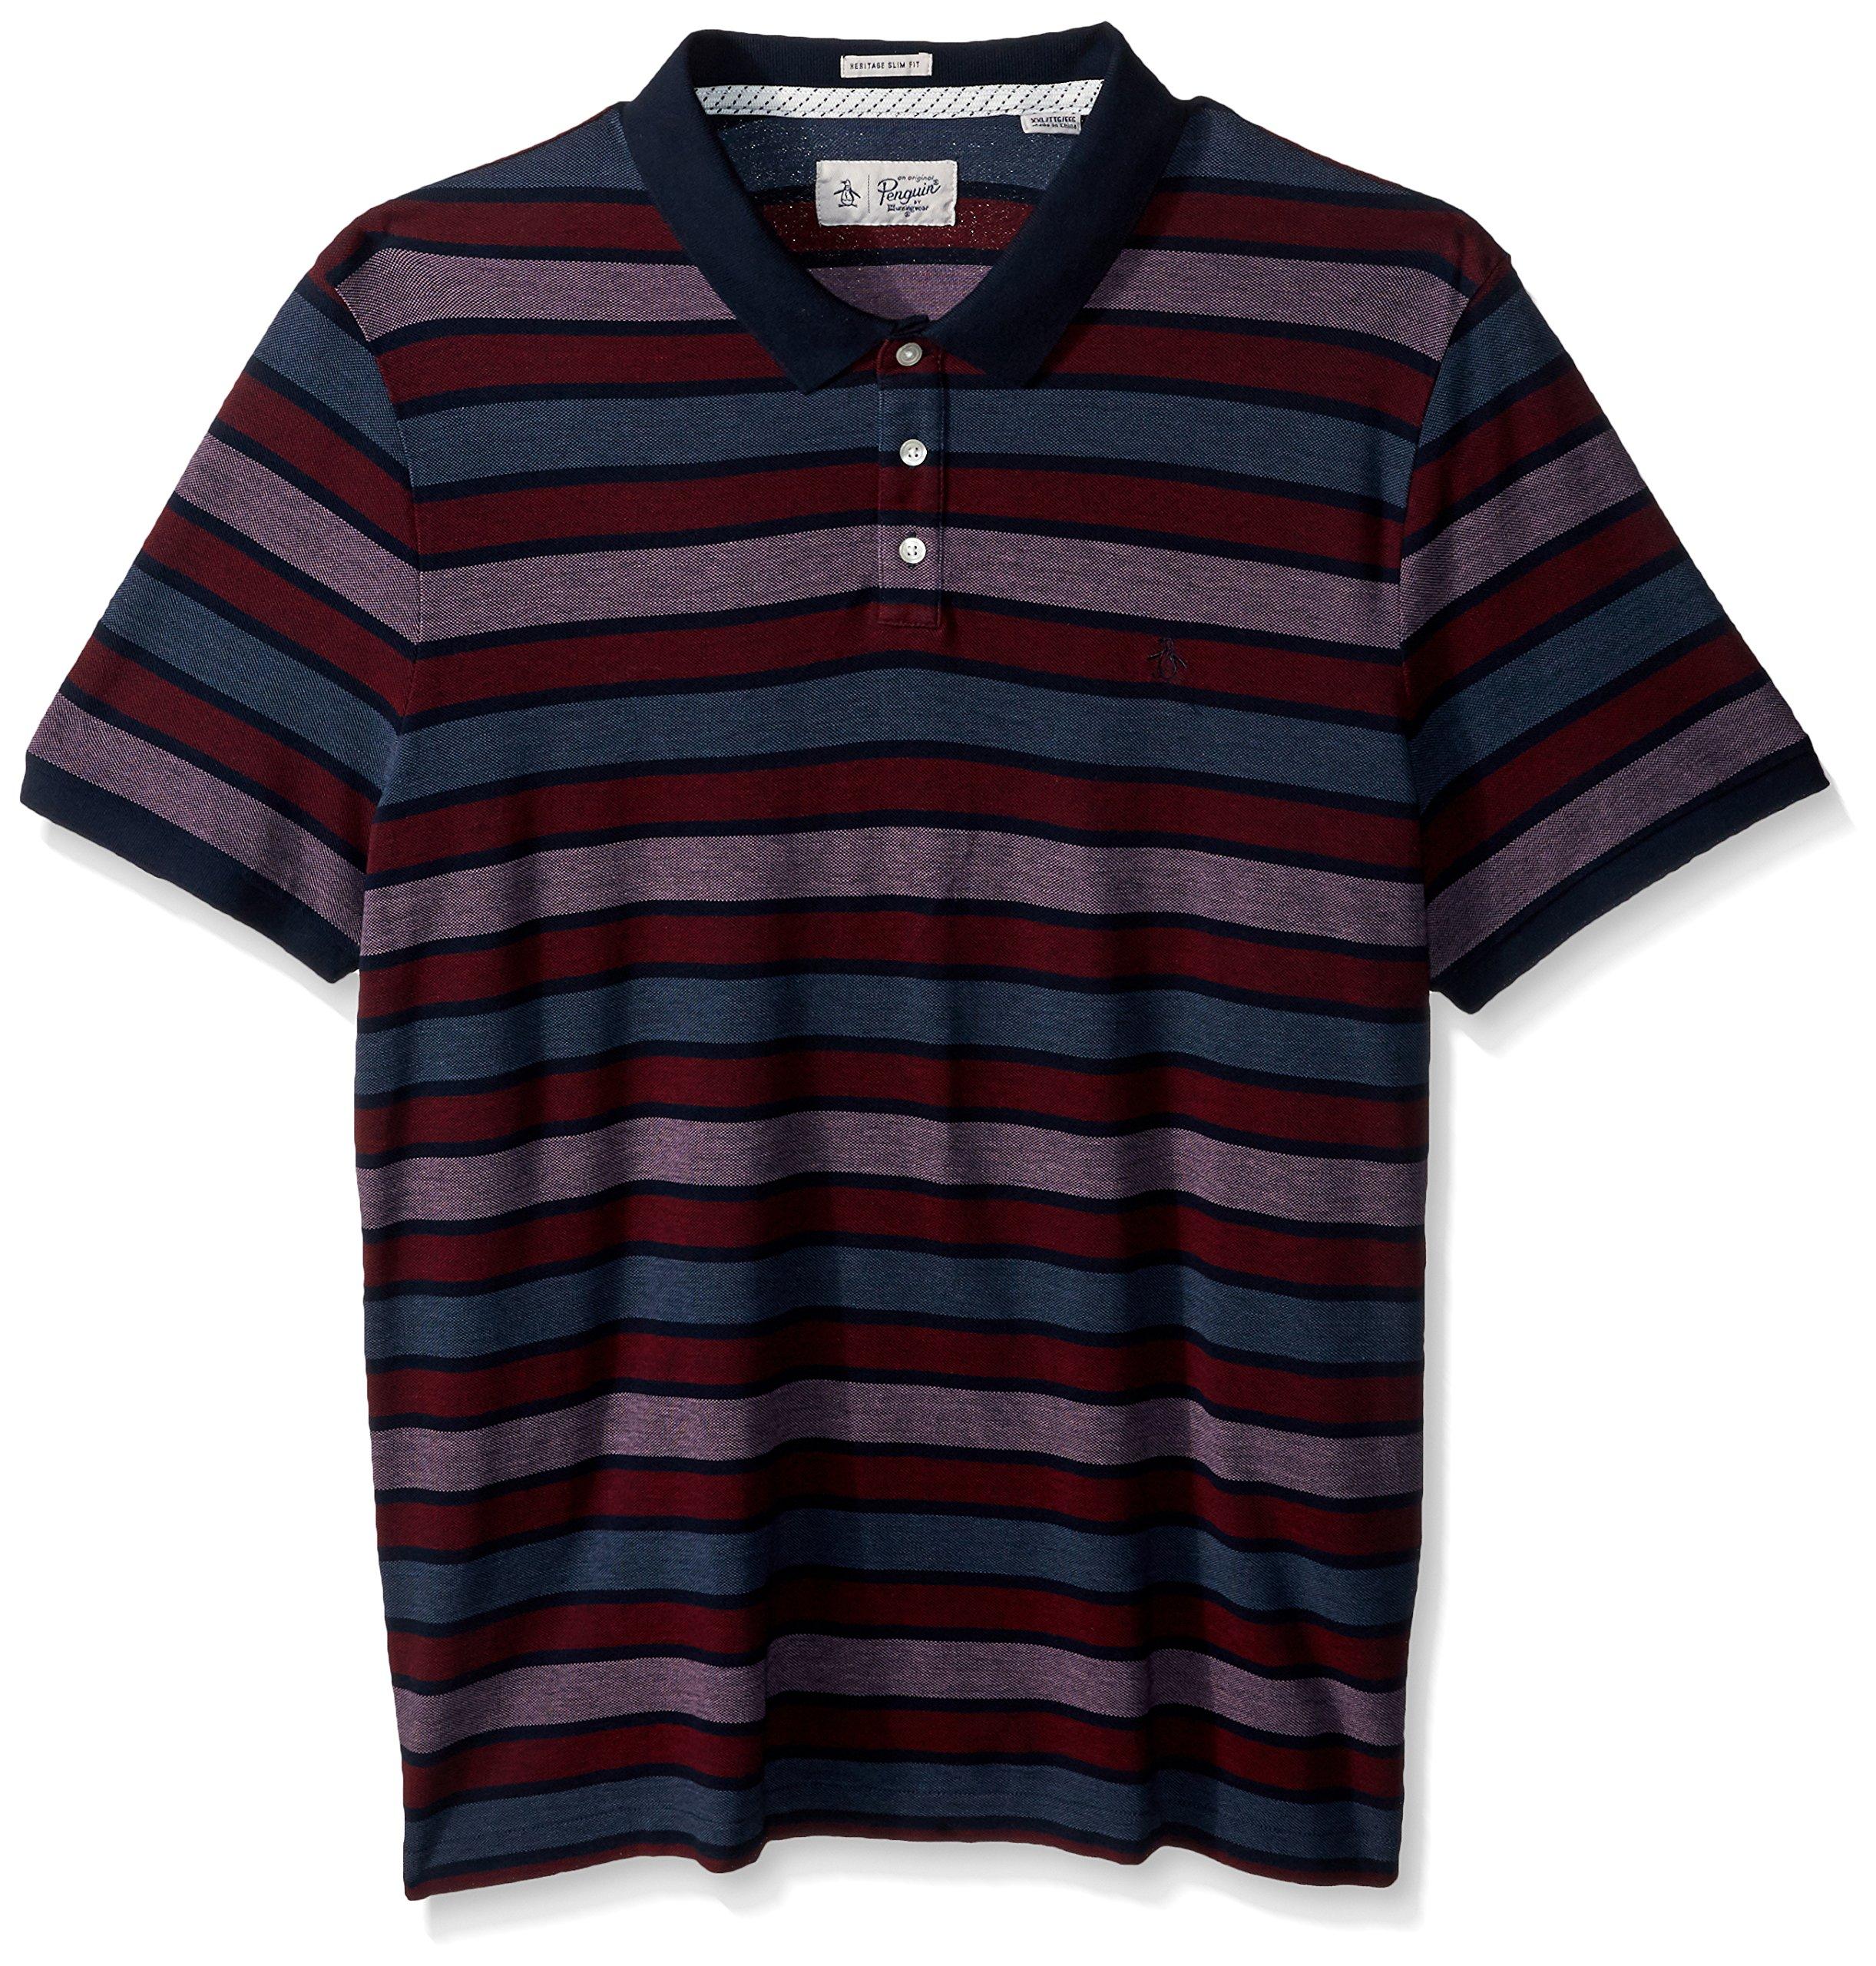 Original Penguin Men's Short Sleeve Birdseye Striped Polo Shirt, Dark Sapphire, Large